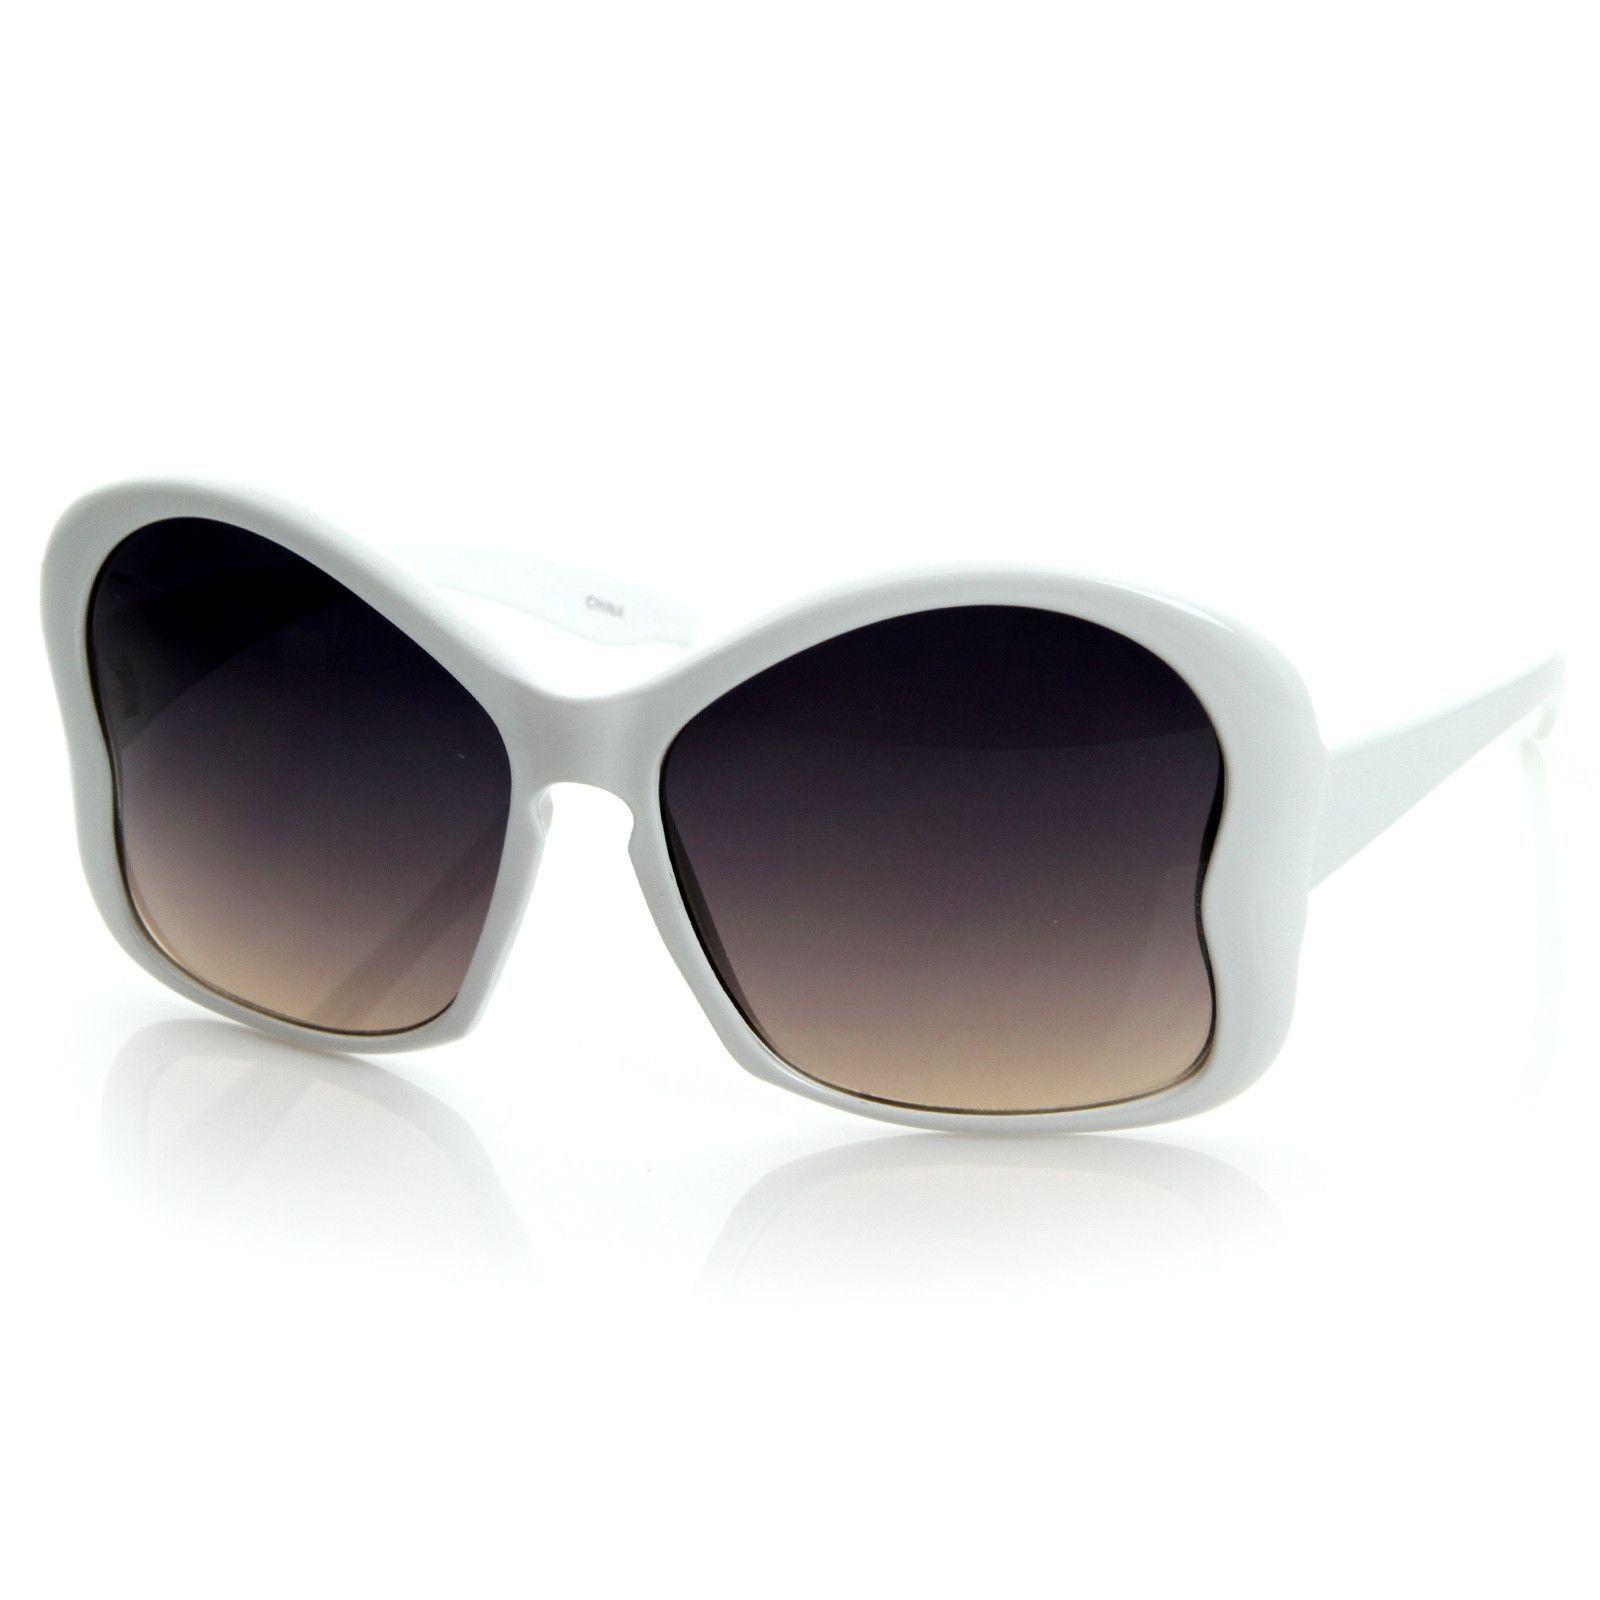 34b1a5c0dc Sexy Womens Fashion NYC Model Designer Oversize Butterfly Shape Sunglasses  8576